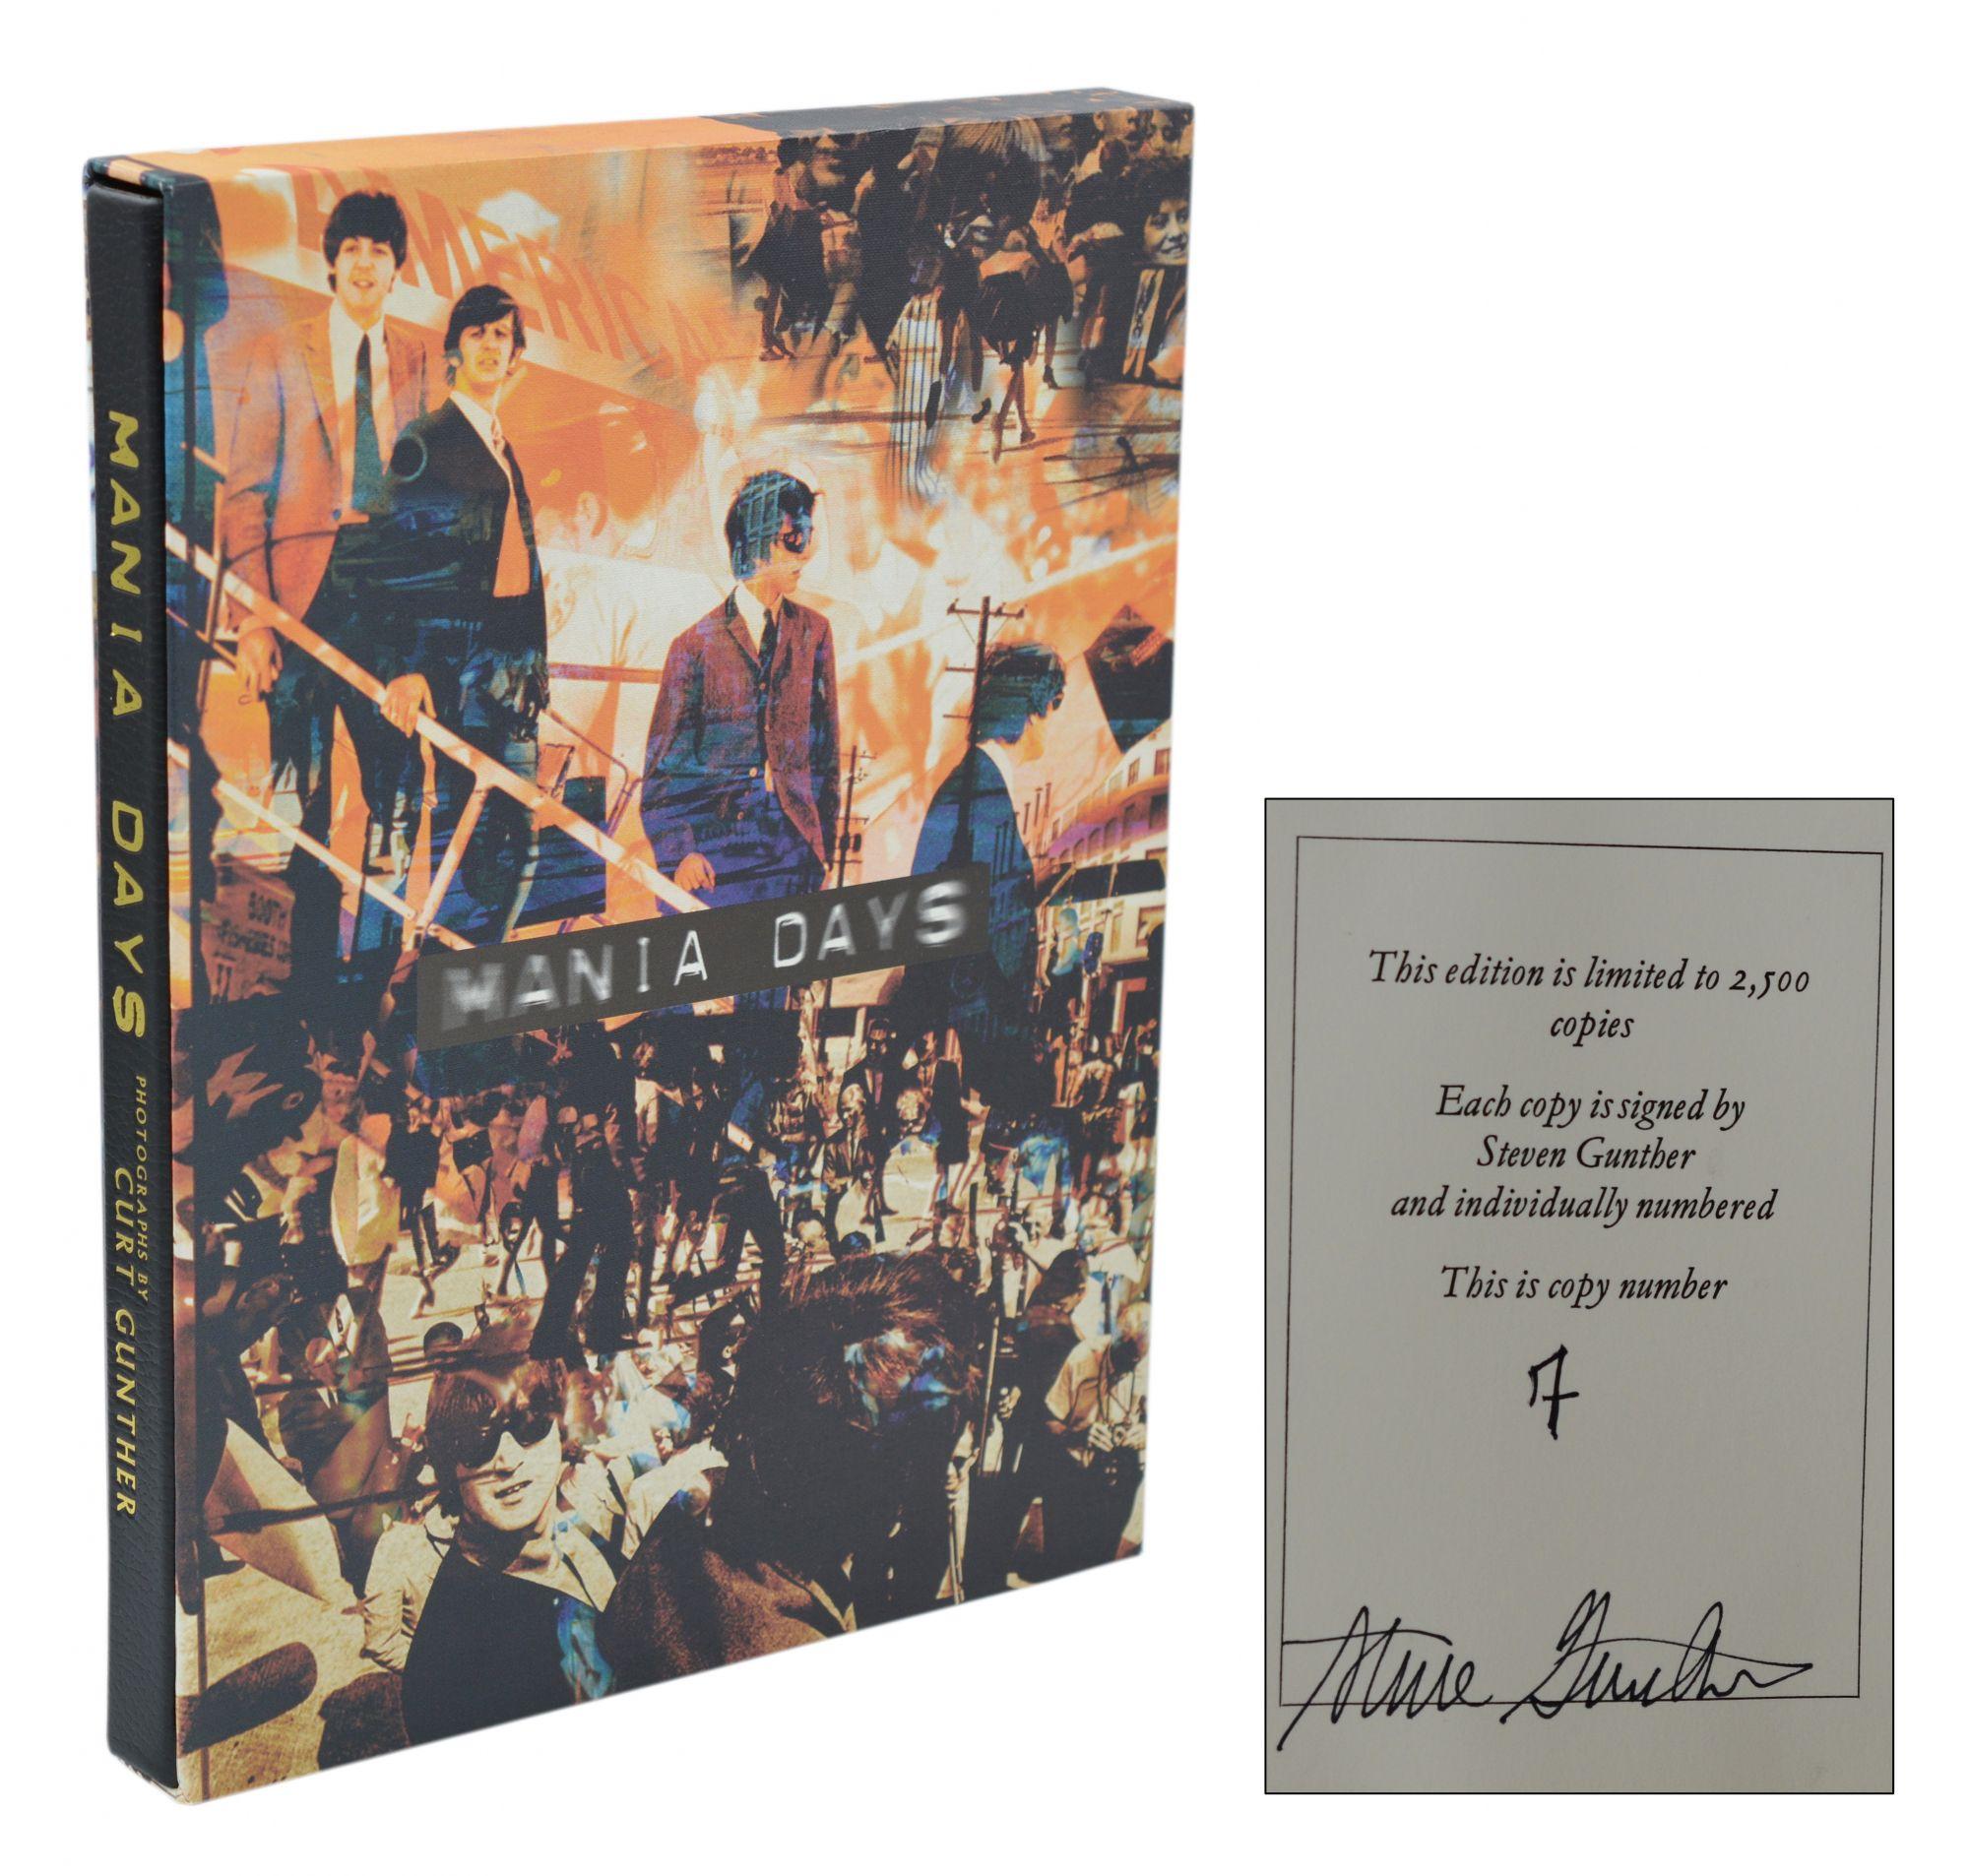 Mania_Days_The_Beatles_1964_US_Tour_The_Beatles_Derek_Taylor_Gunther_Curt_Photographs_Très_bon